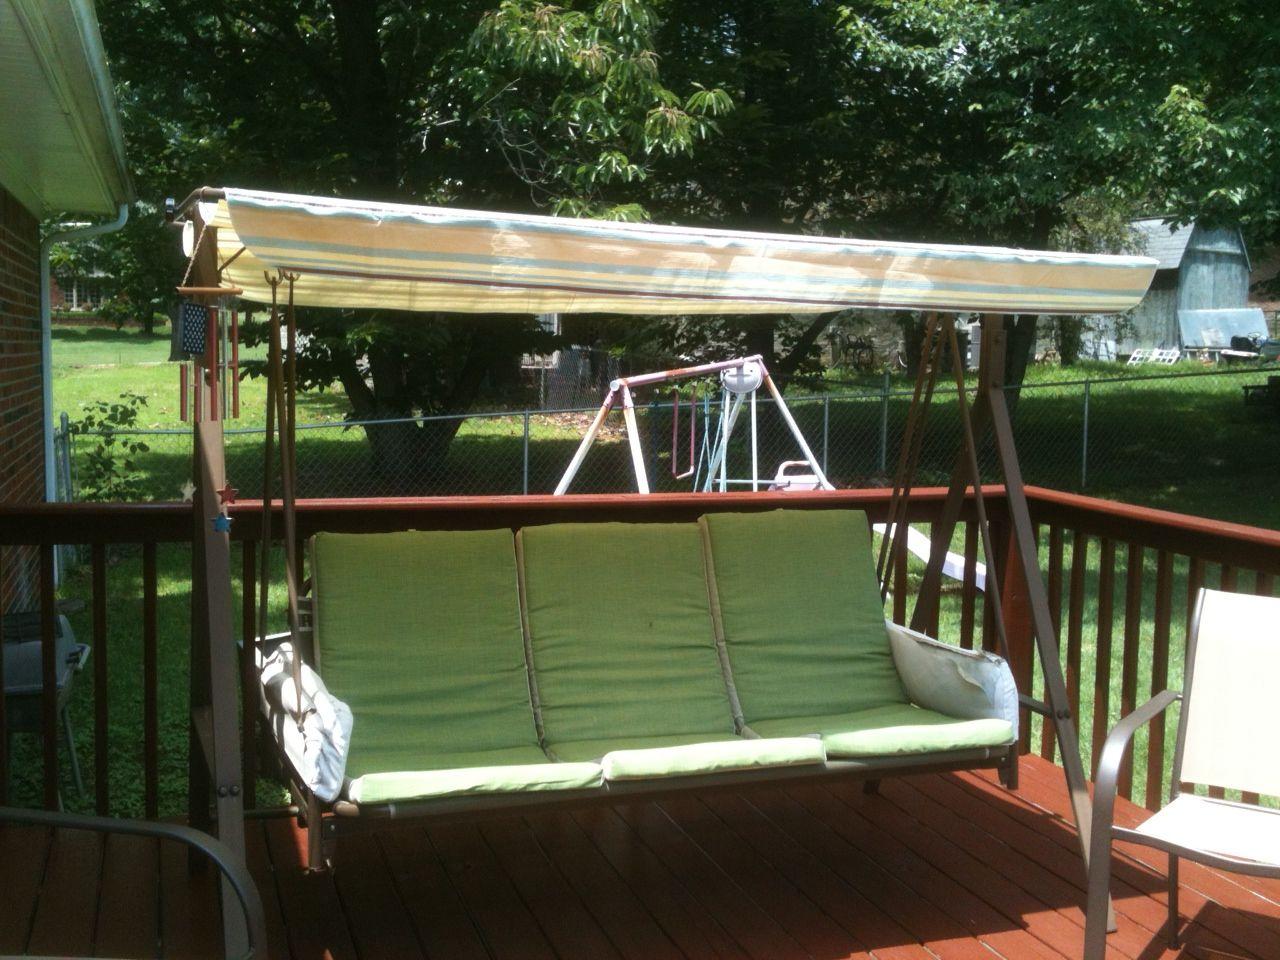 Replacement Swing Canopy Diy Outdoor Decor Patio Swing Canopy Diy Patio